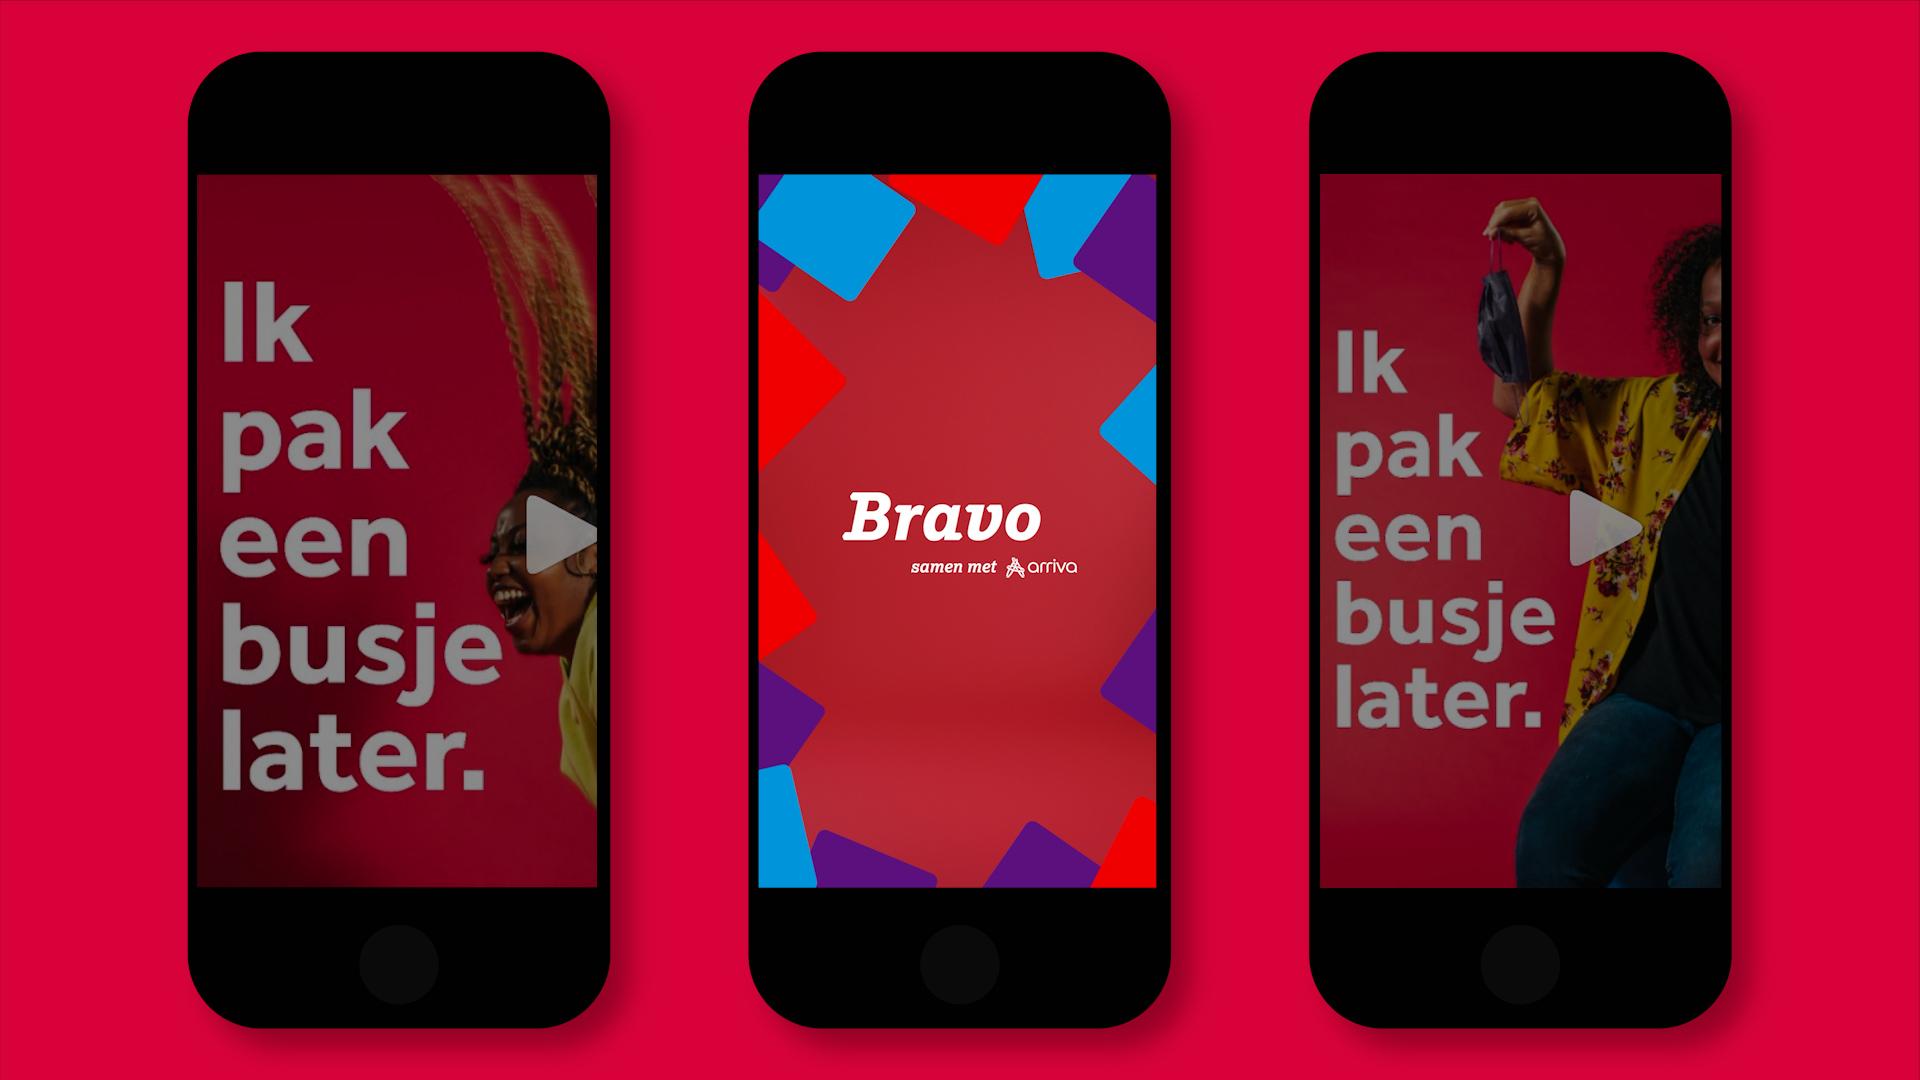 Bravo – Pak een busje later